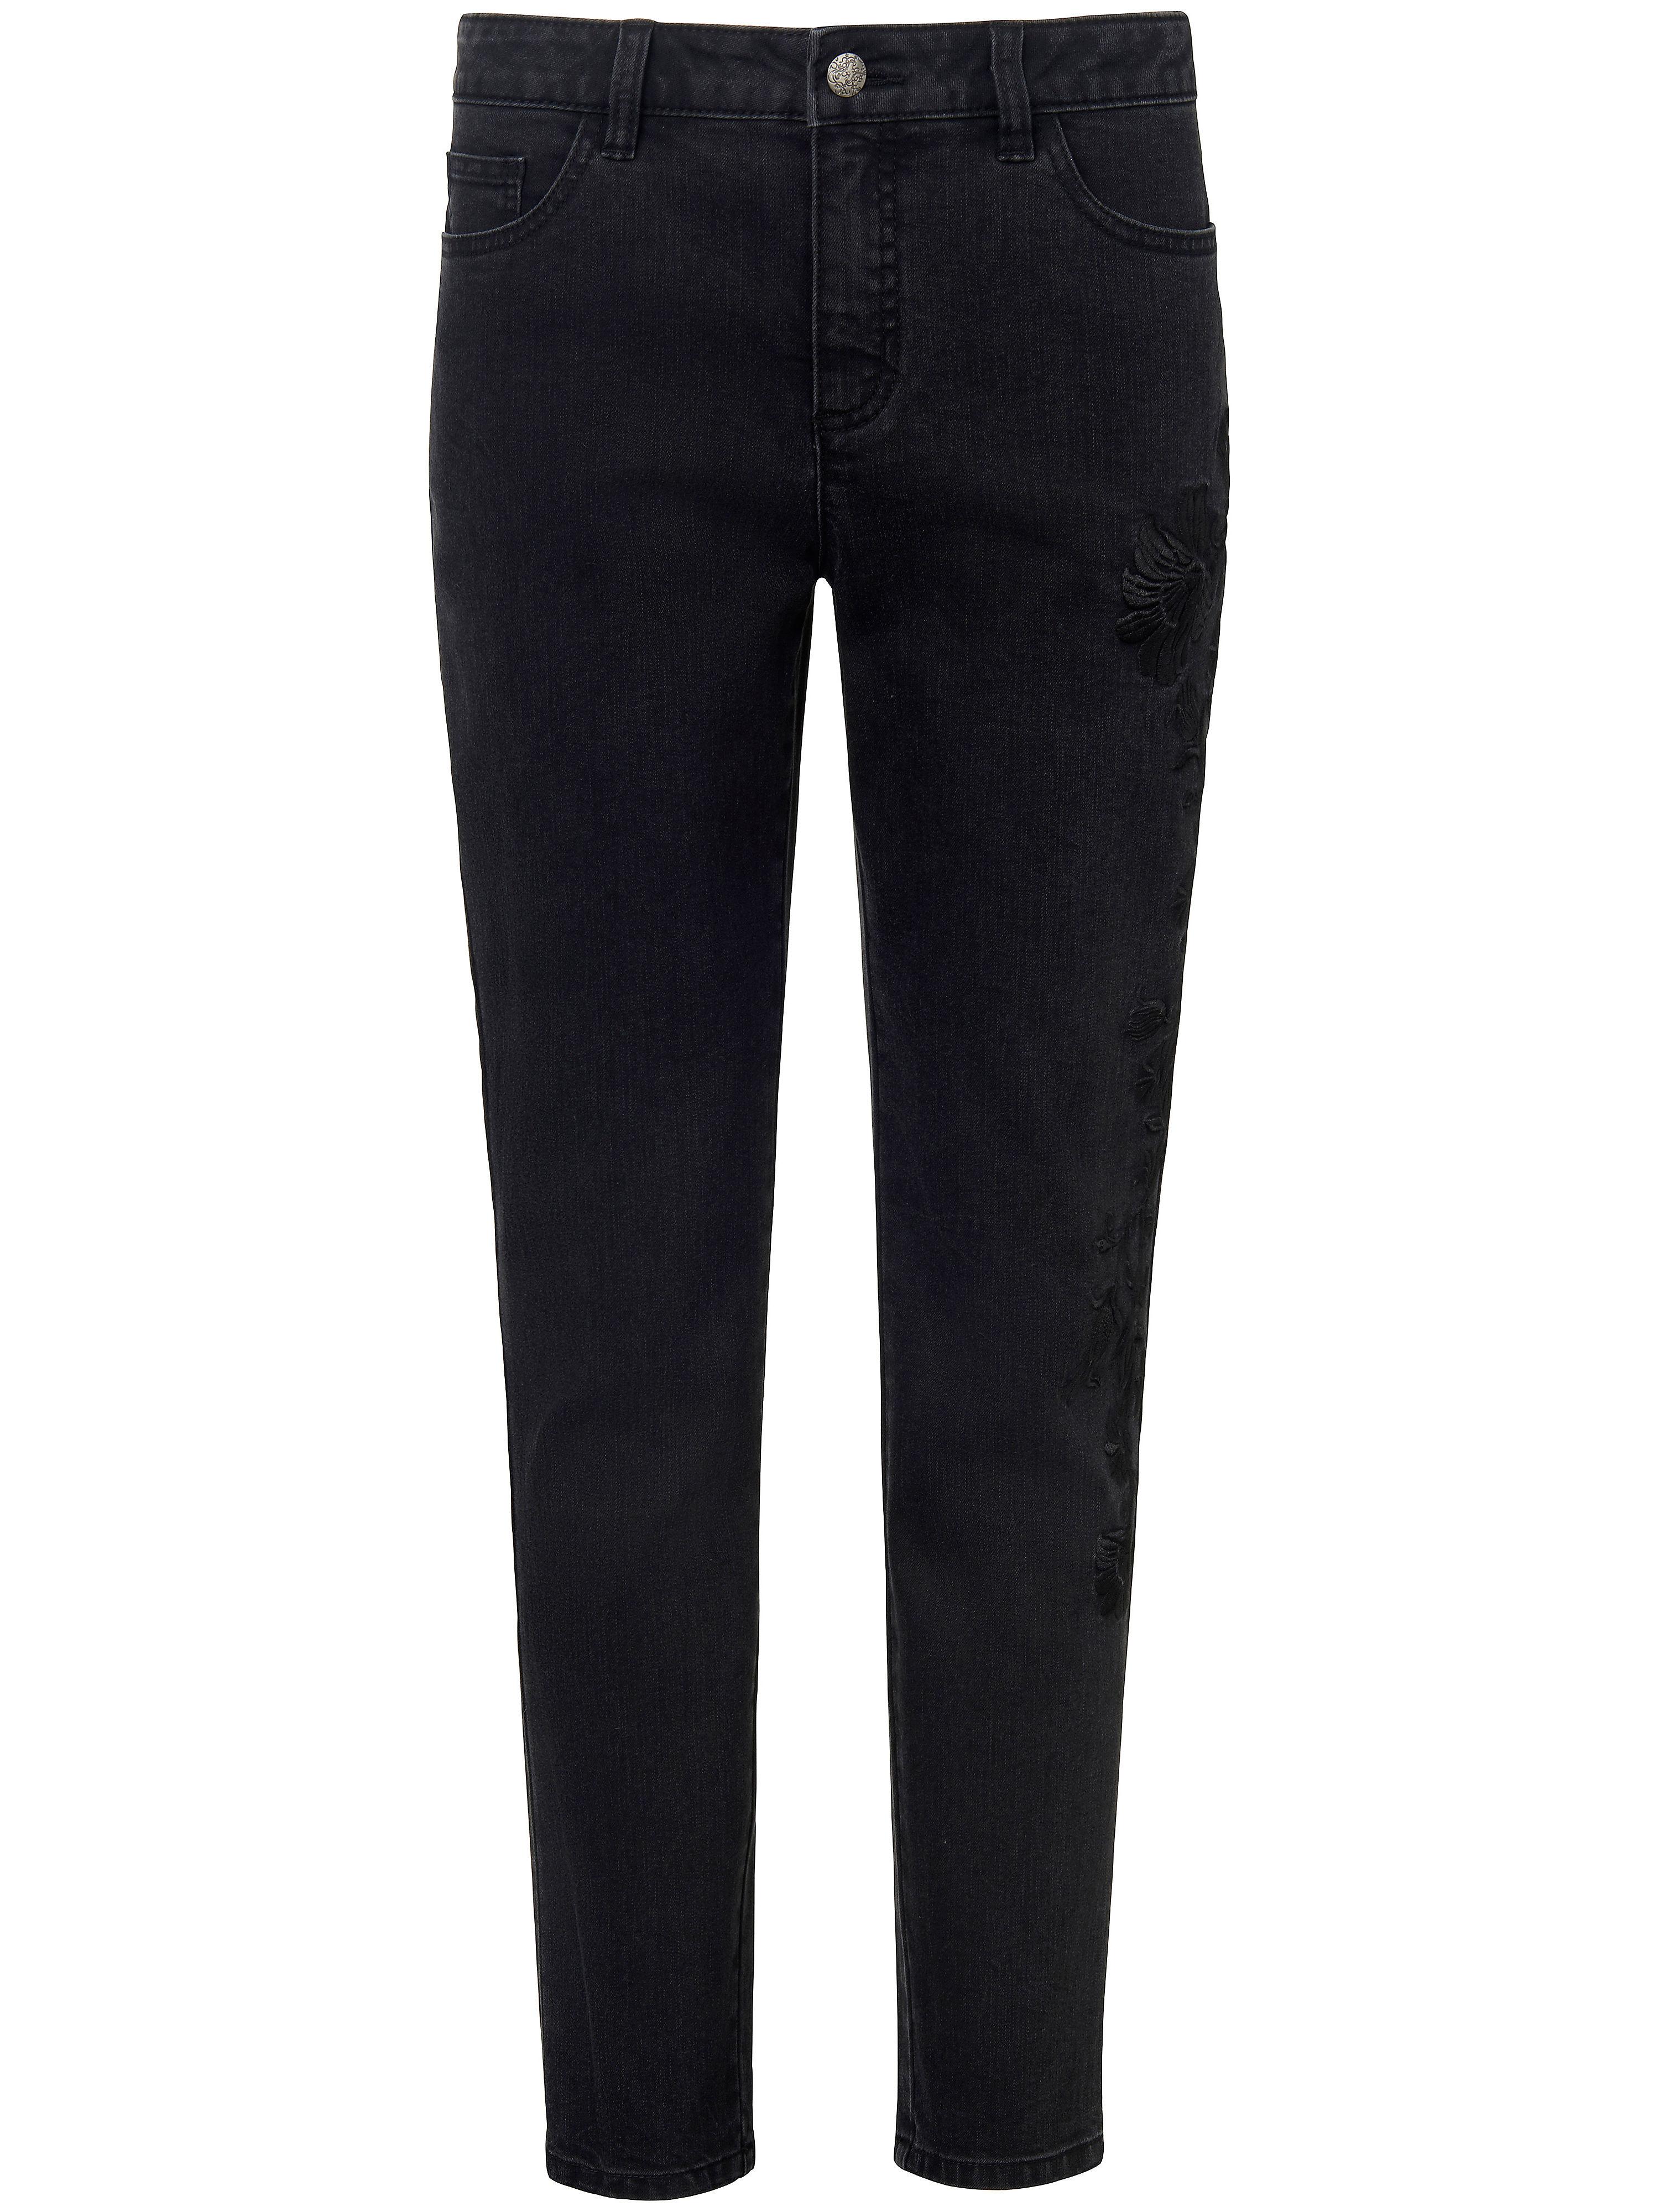 Le jean  MYBC noir taille 44